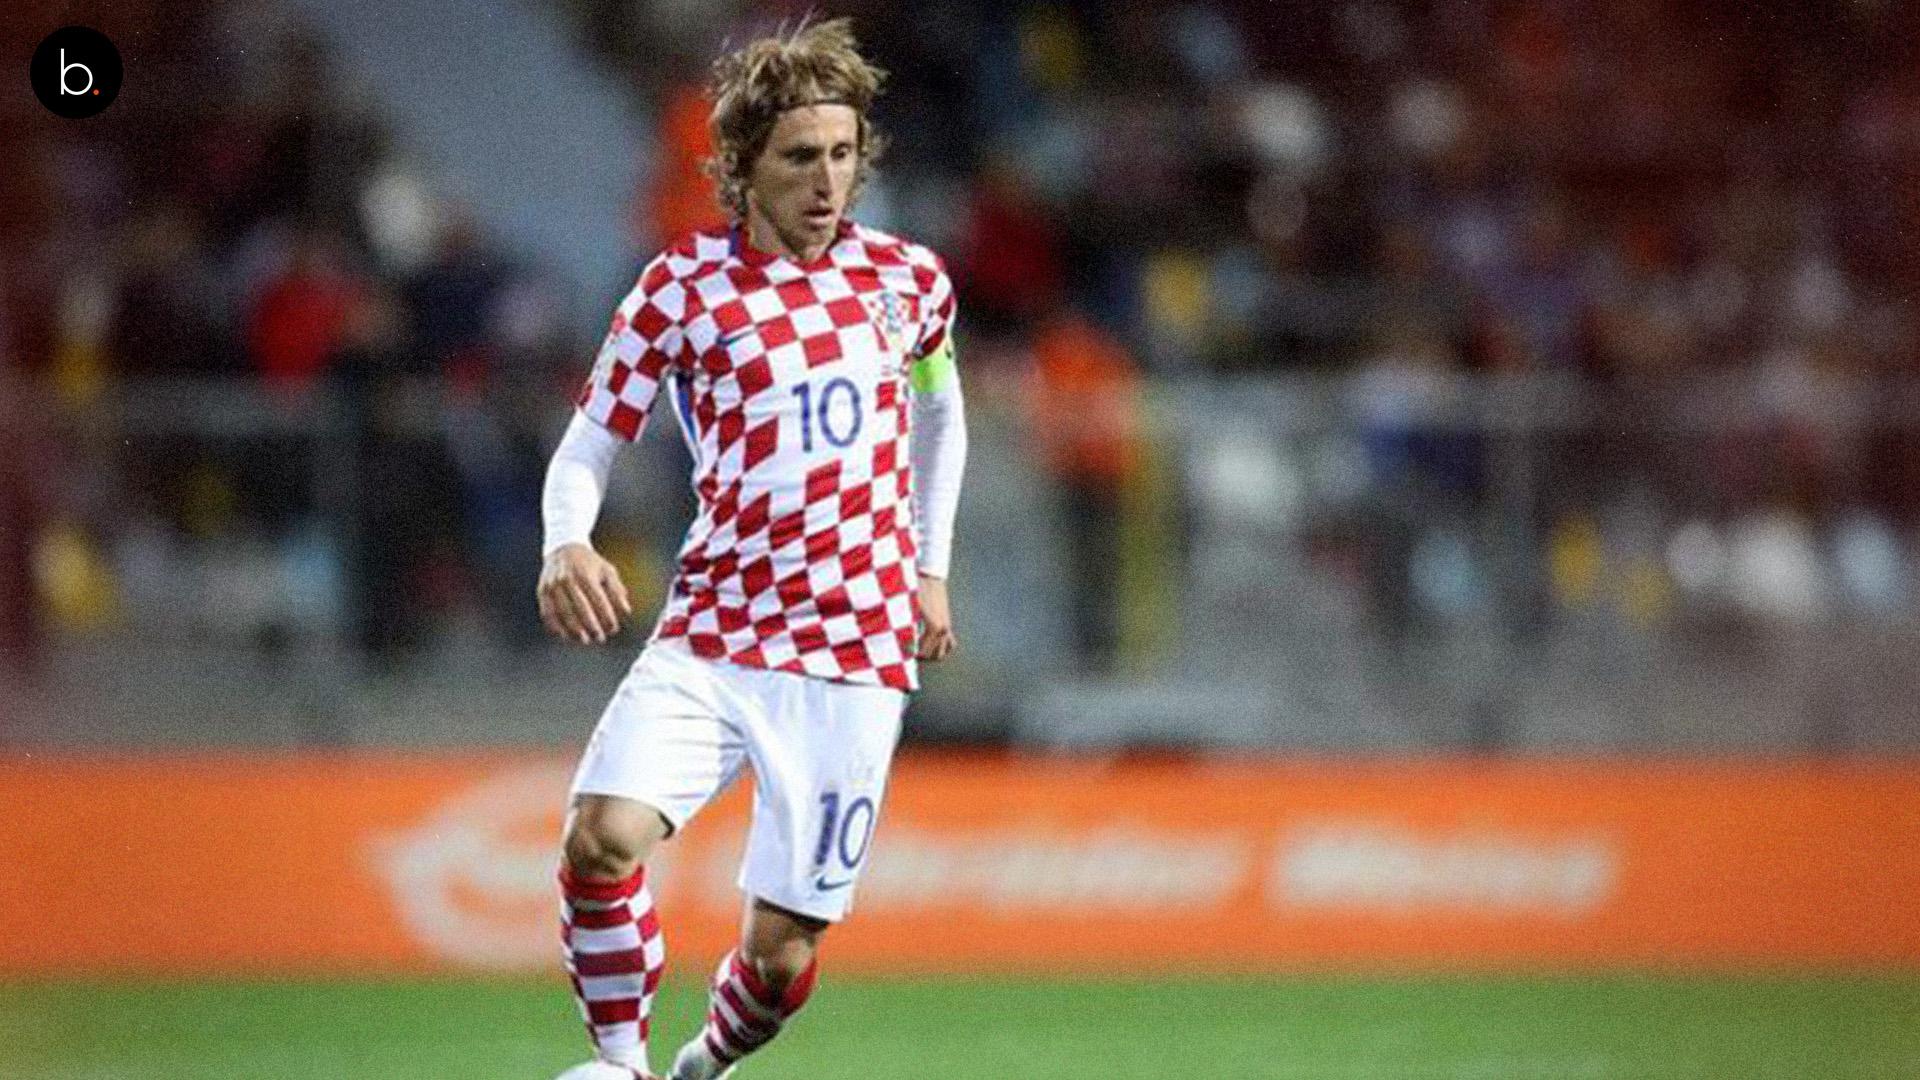 Luka Modric consigue su tercer MVP en Mundial de Rusia 2018